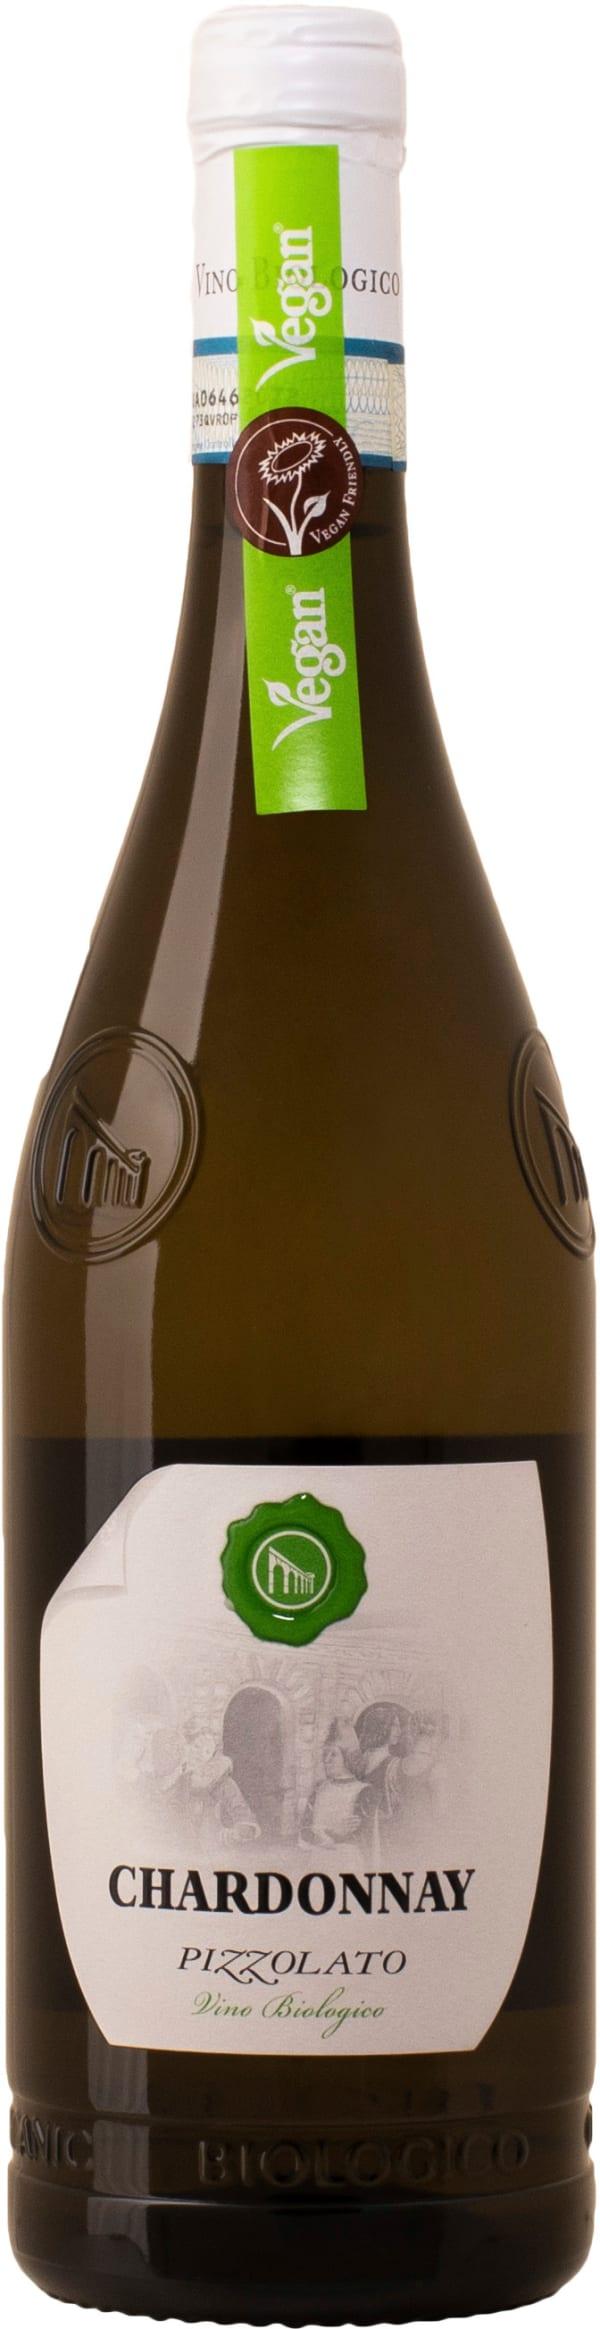 Pizzolato Vino Biologico Chardonnay 2017